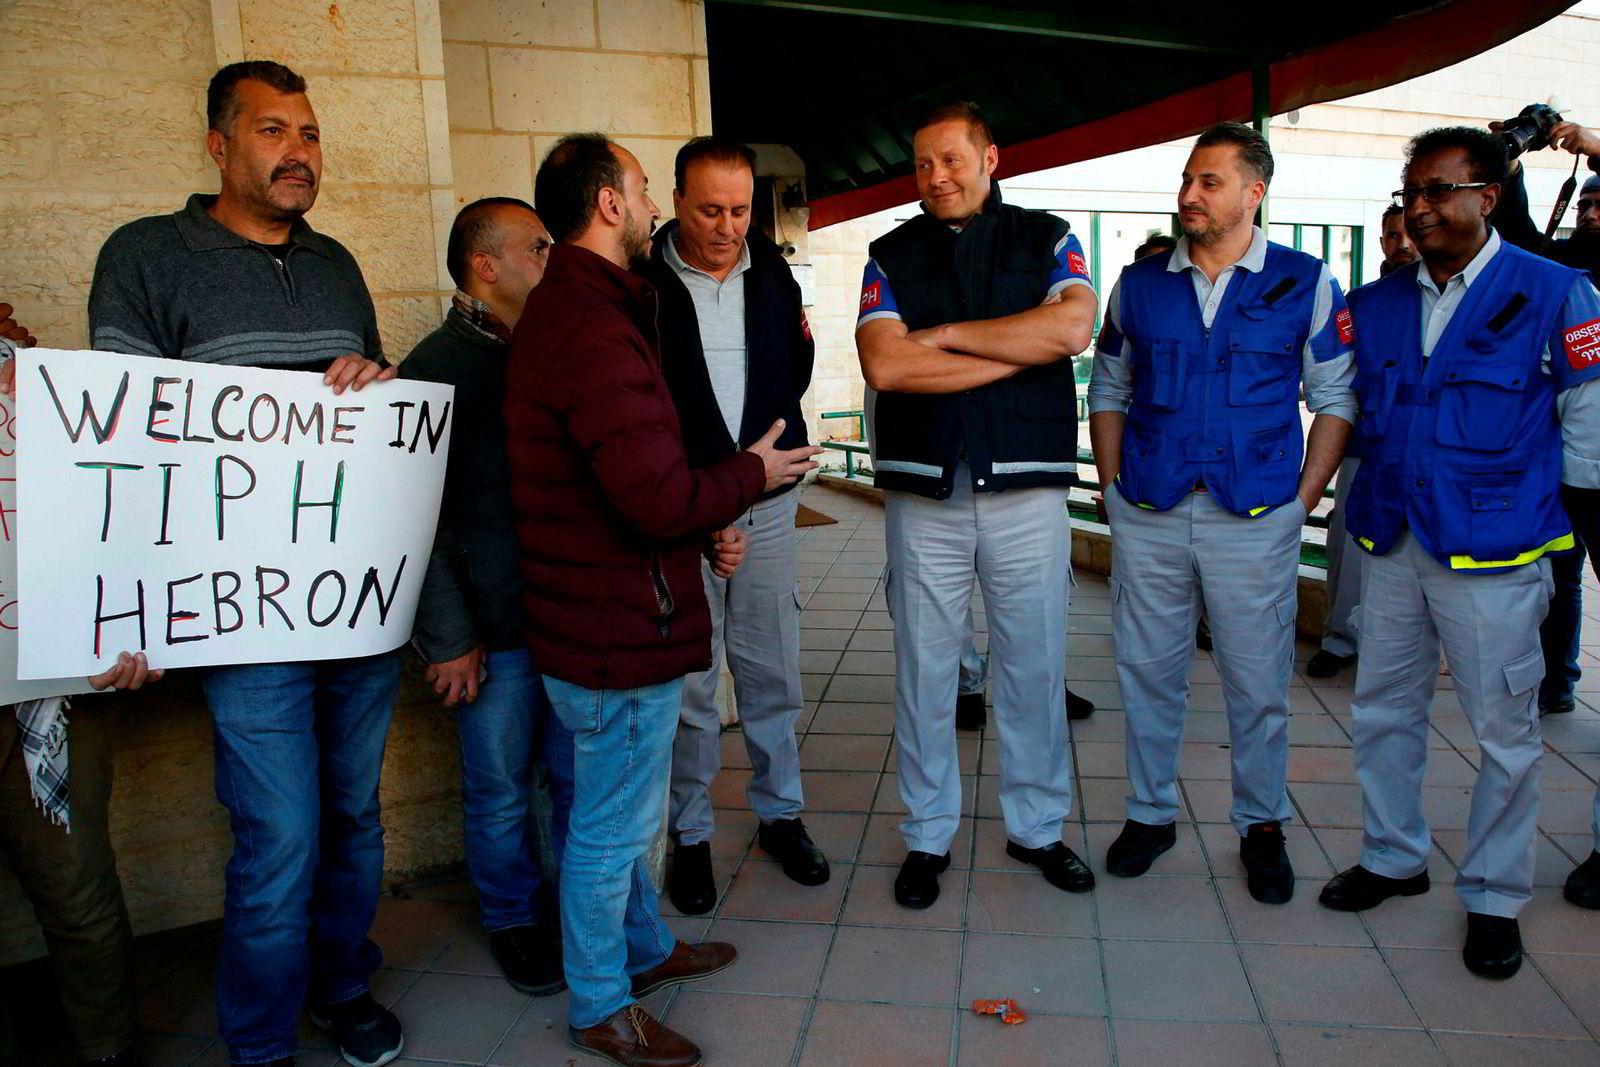 Observatører fra TIPH, her sammen med lokale palestinere, foran hovedkvarteret i Hebron. Nå må de forlate området.